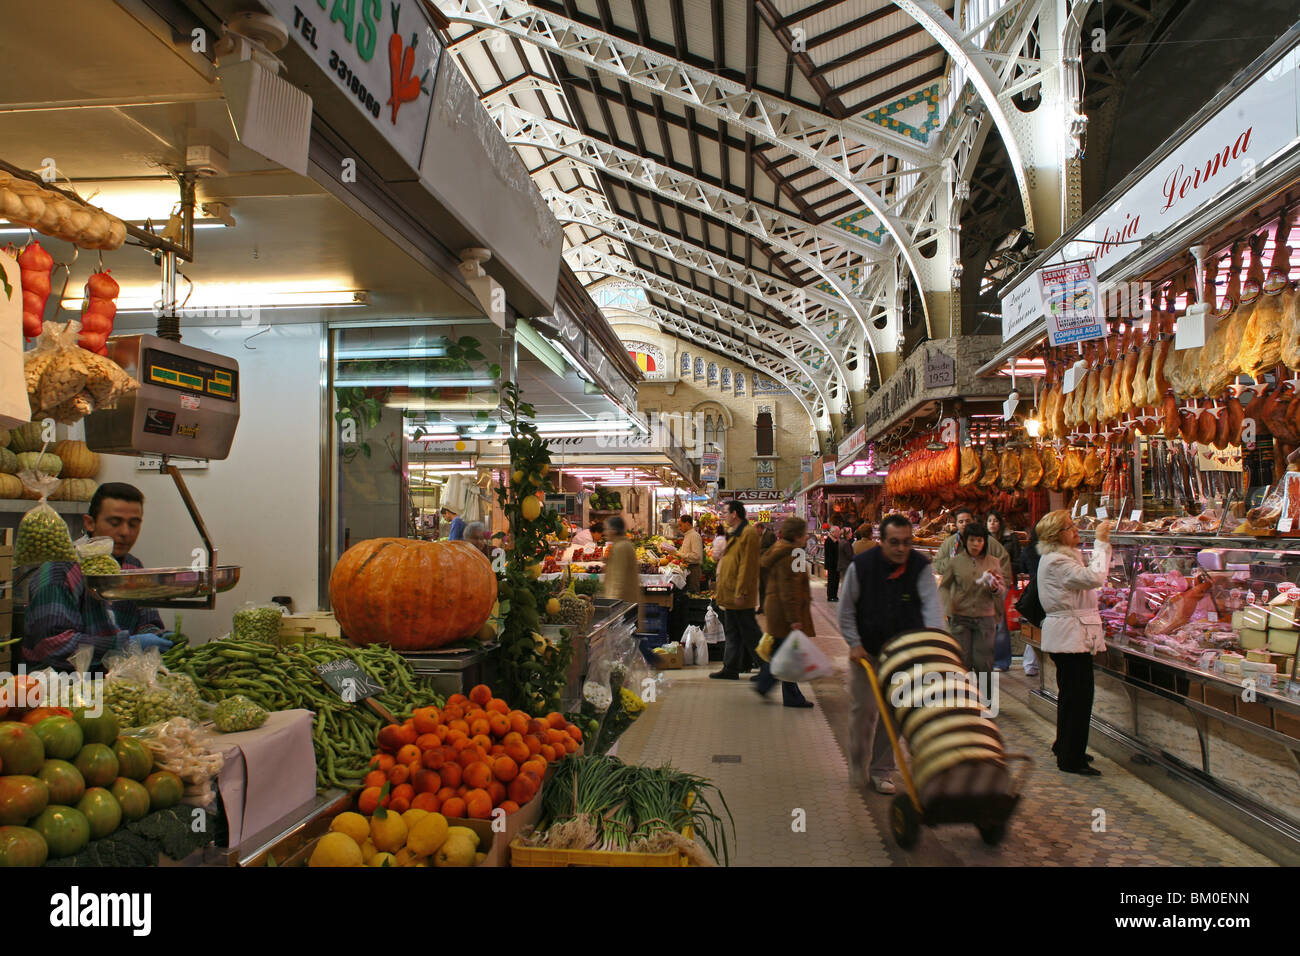 Mercado Central, central market, Valencia, Spain Stock Photo, Royalty Free Im...